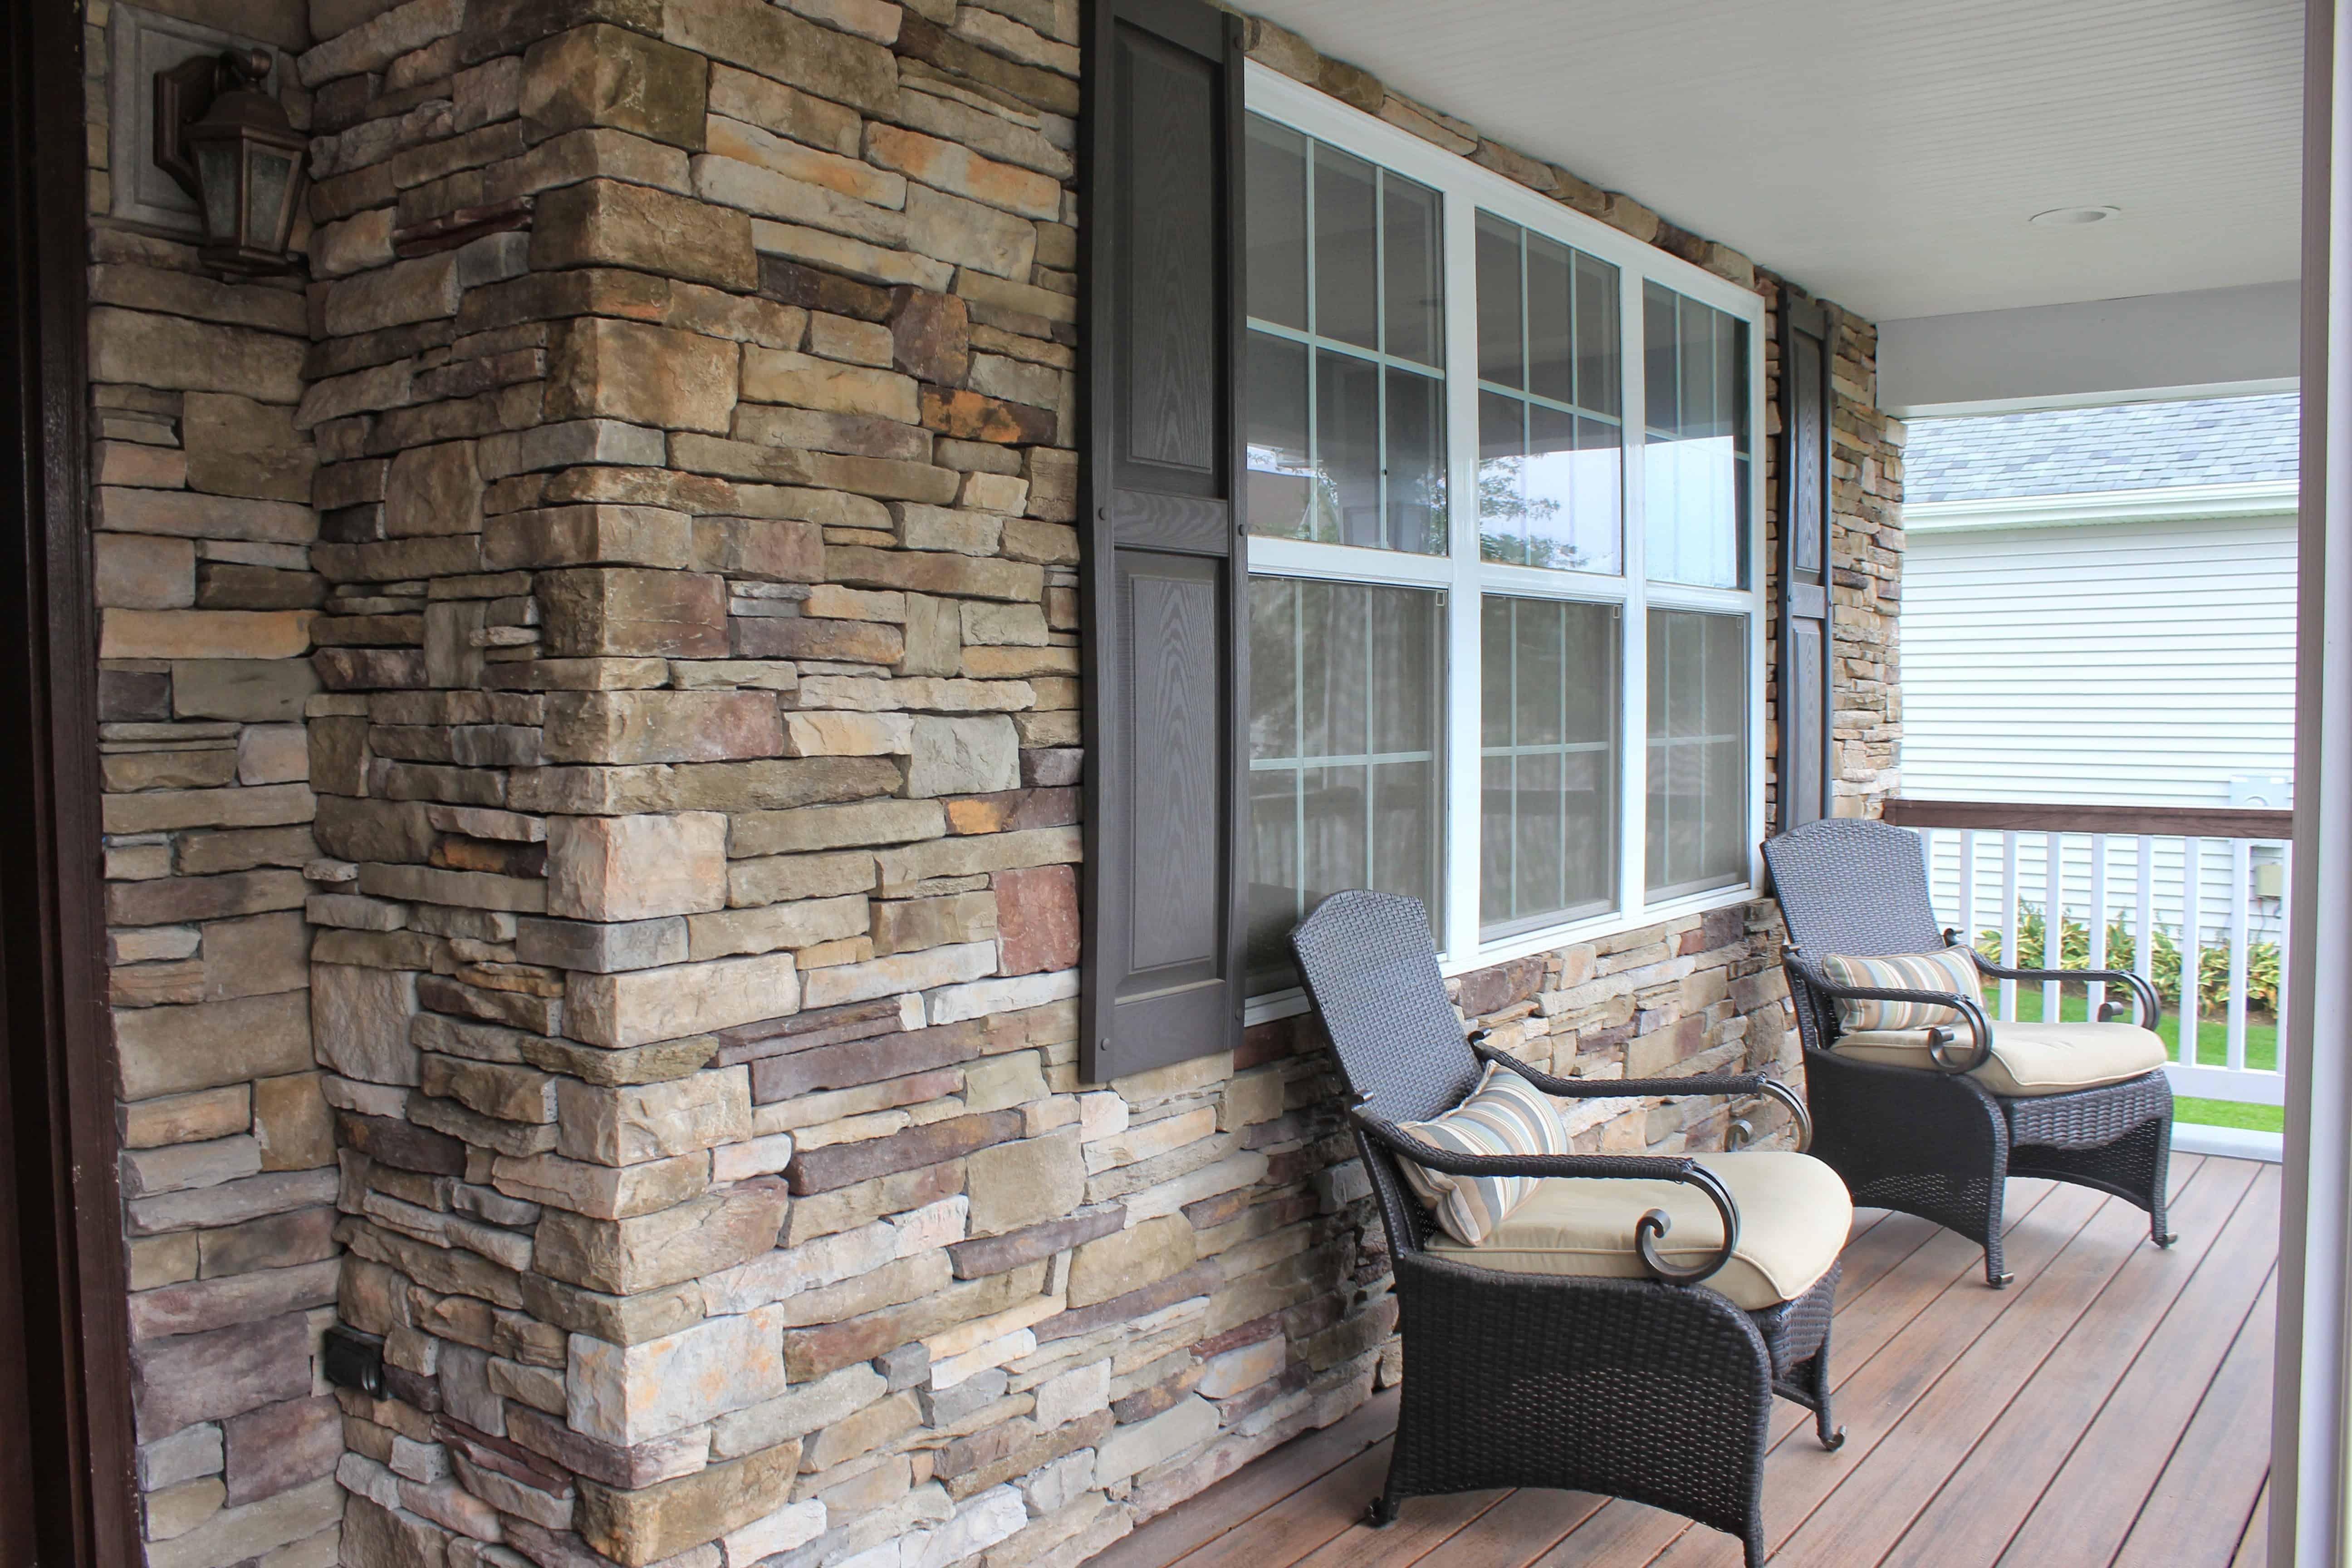 Façade veneered with - Cultured Stone Southern Ledgestone - Bucks County - Melville, Long Island NY